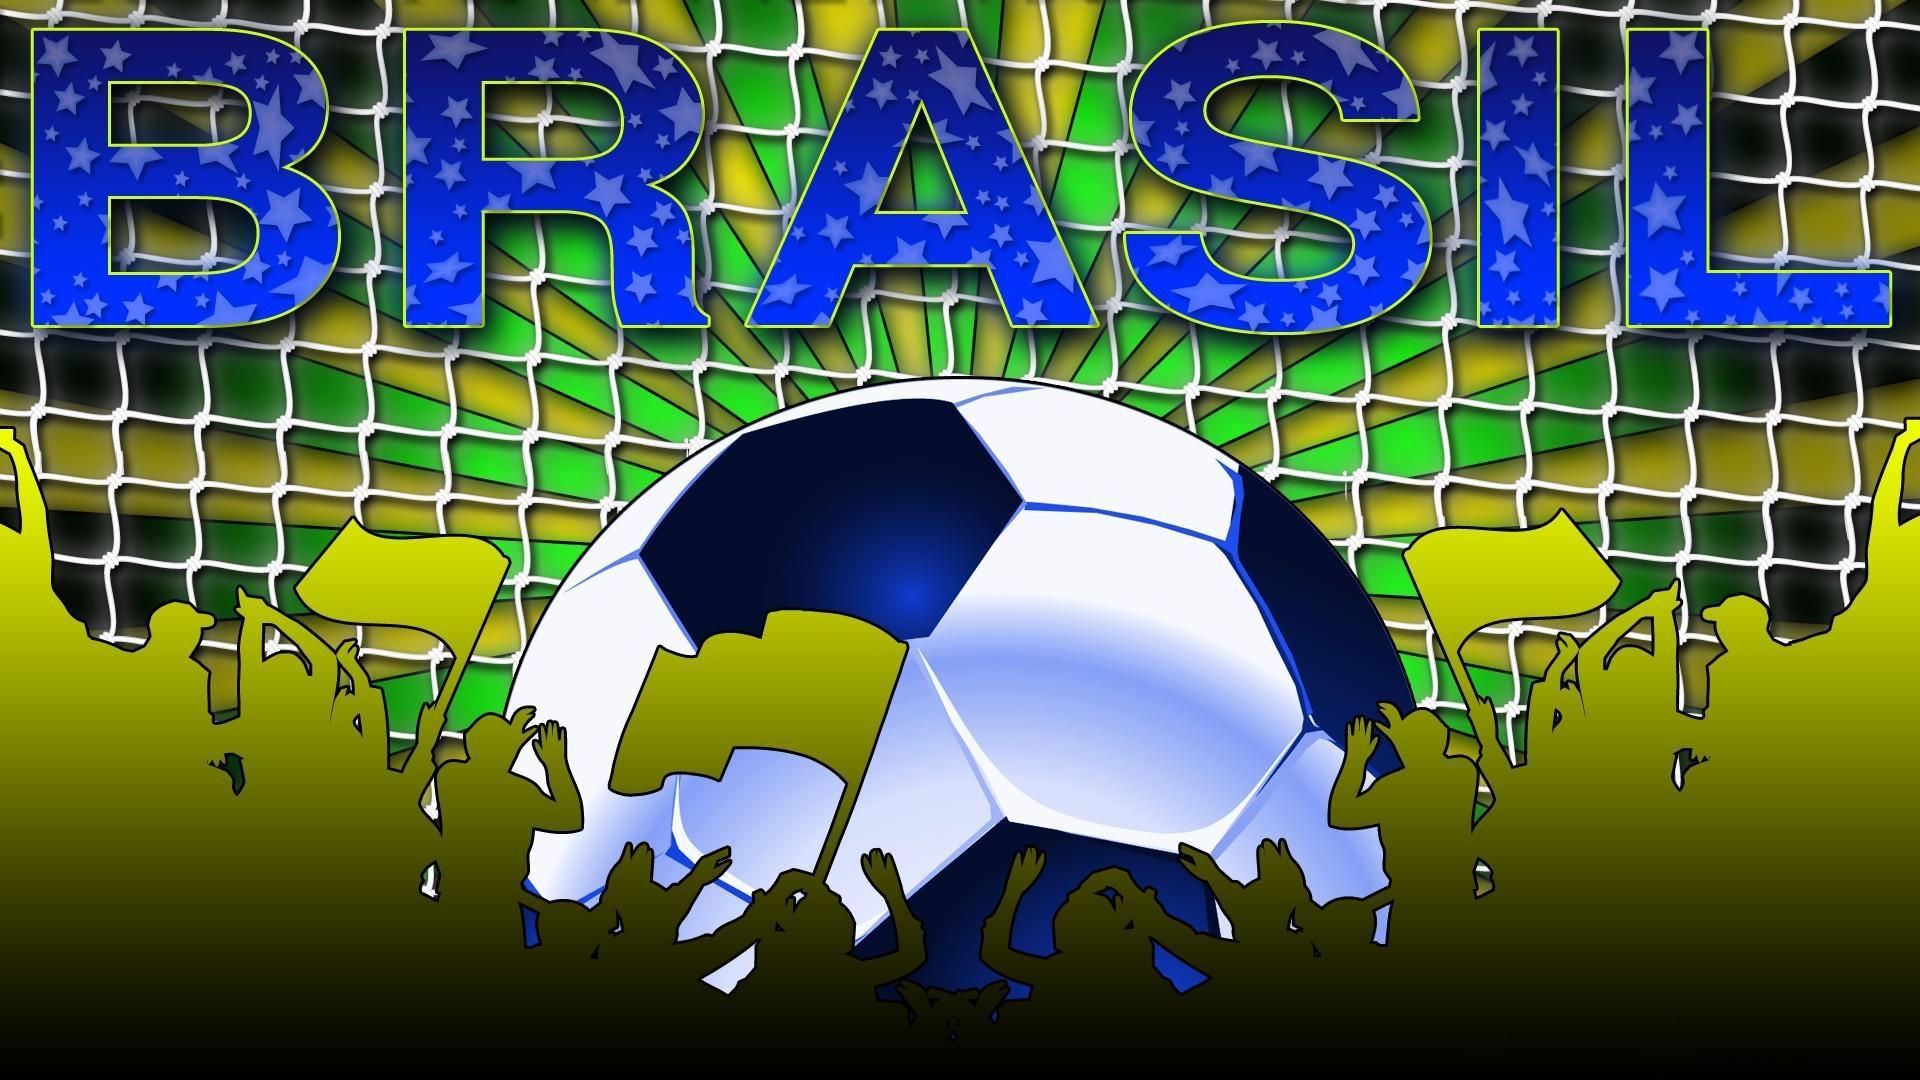 Brazil Soccer HD Wallpaper 1920x1080